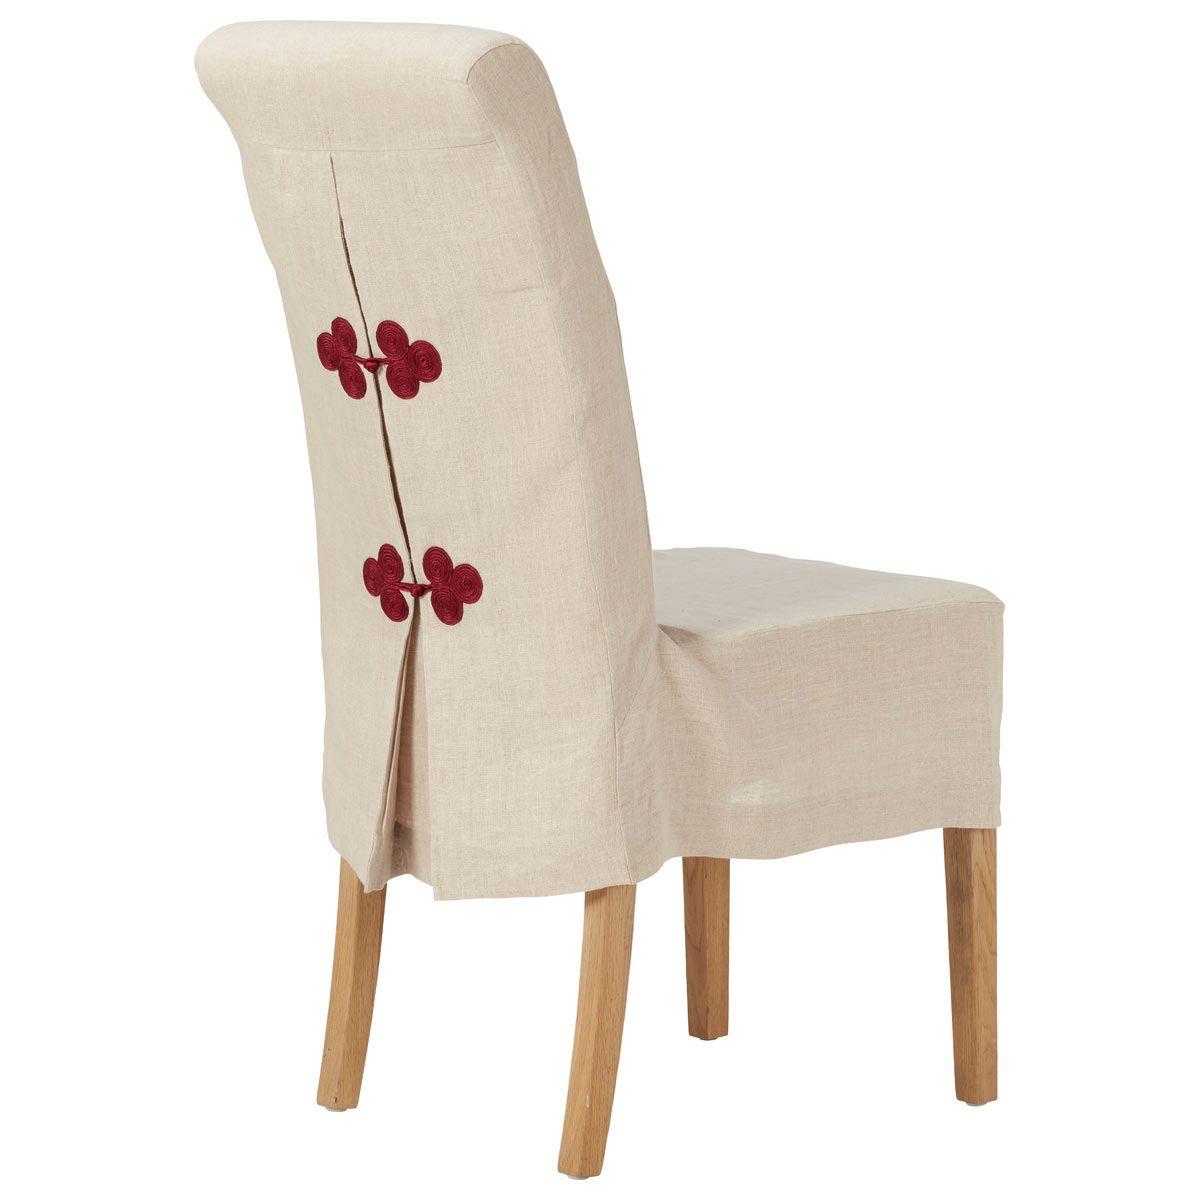 Guizhou Linen Slip Cover For Echo Dining Chair Natural Red In 2021 Dining Chair Covers Slipcovers Dining Room Chair Slipcovers Chair Covers Slipcover